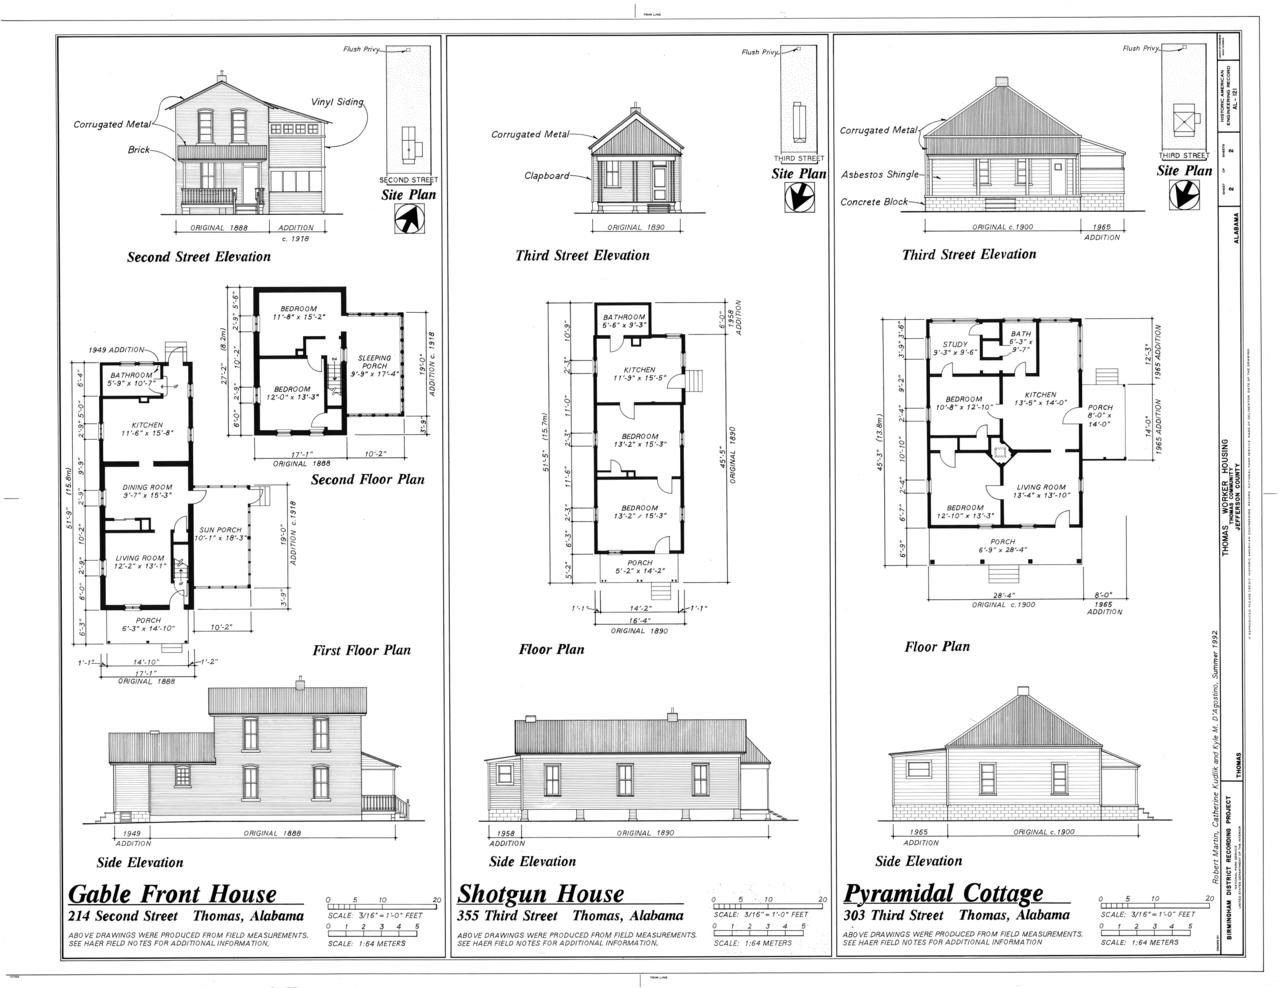 FileGable Front House Shotgun House and Pyramidal